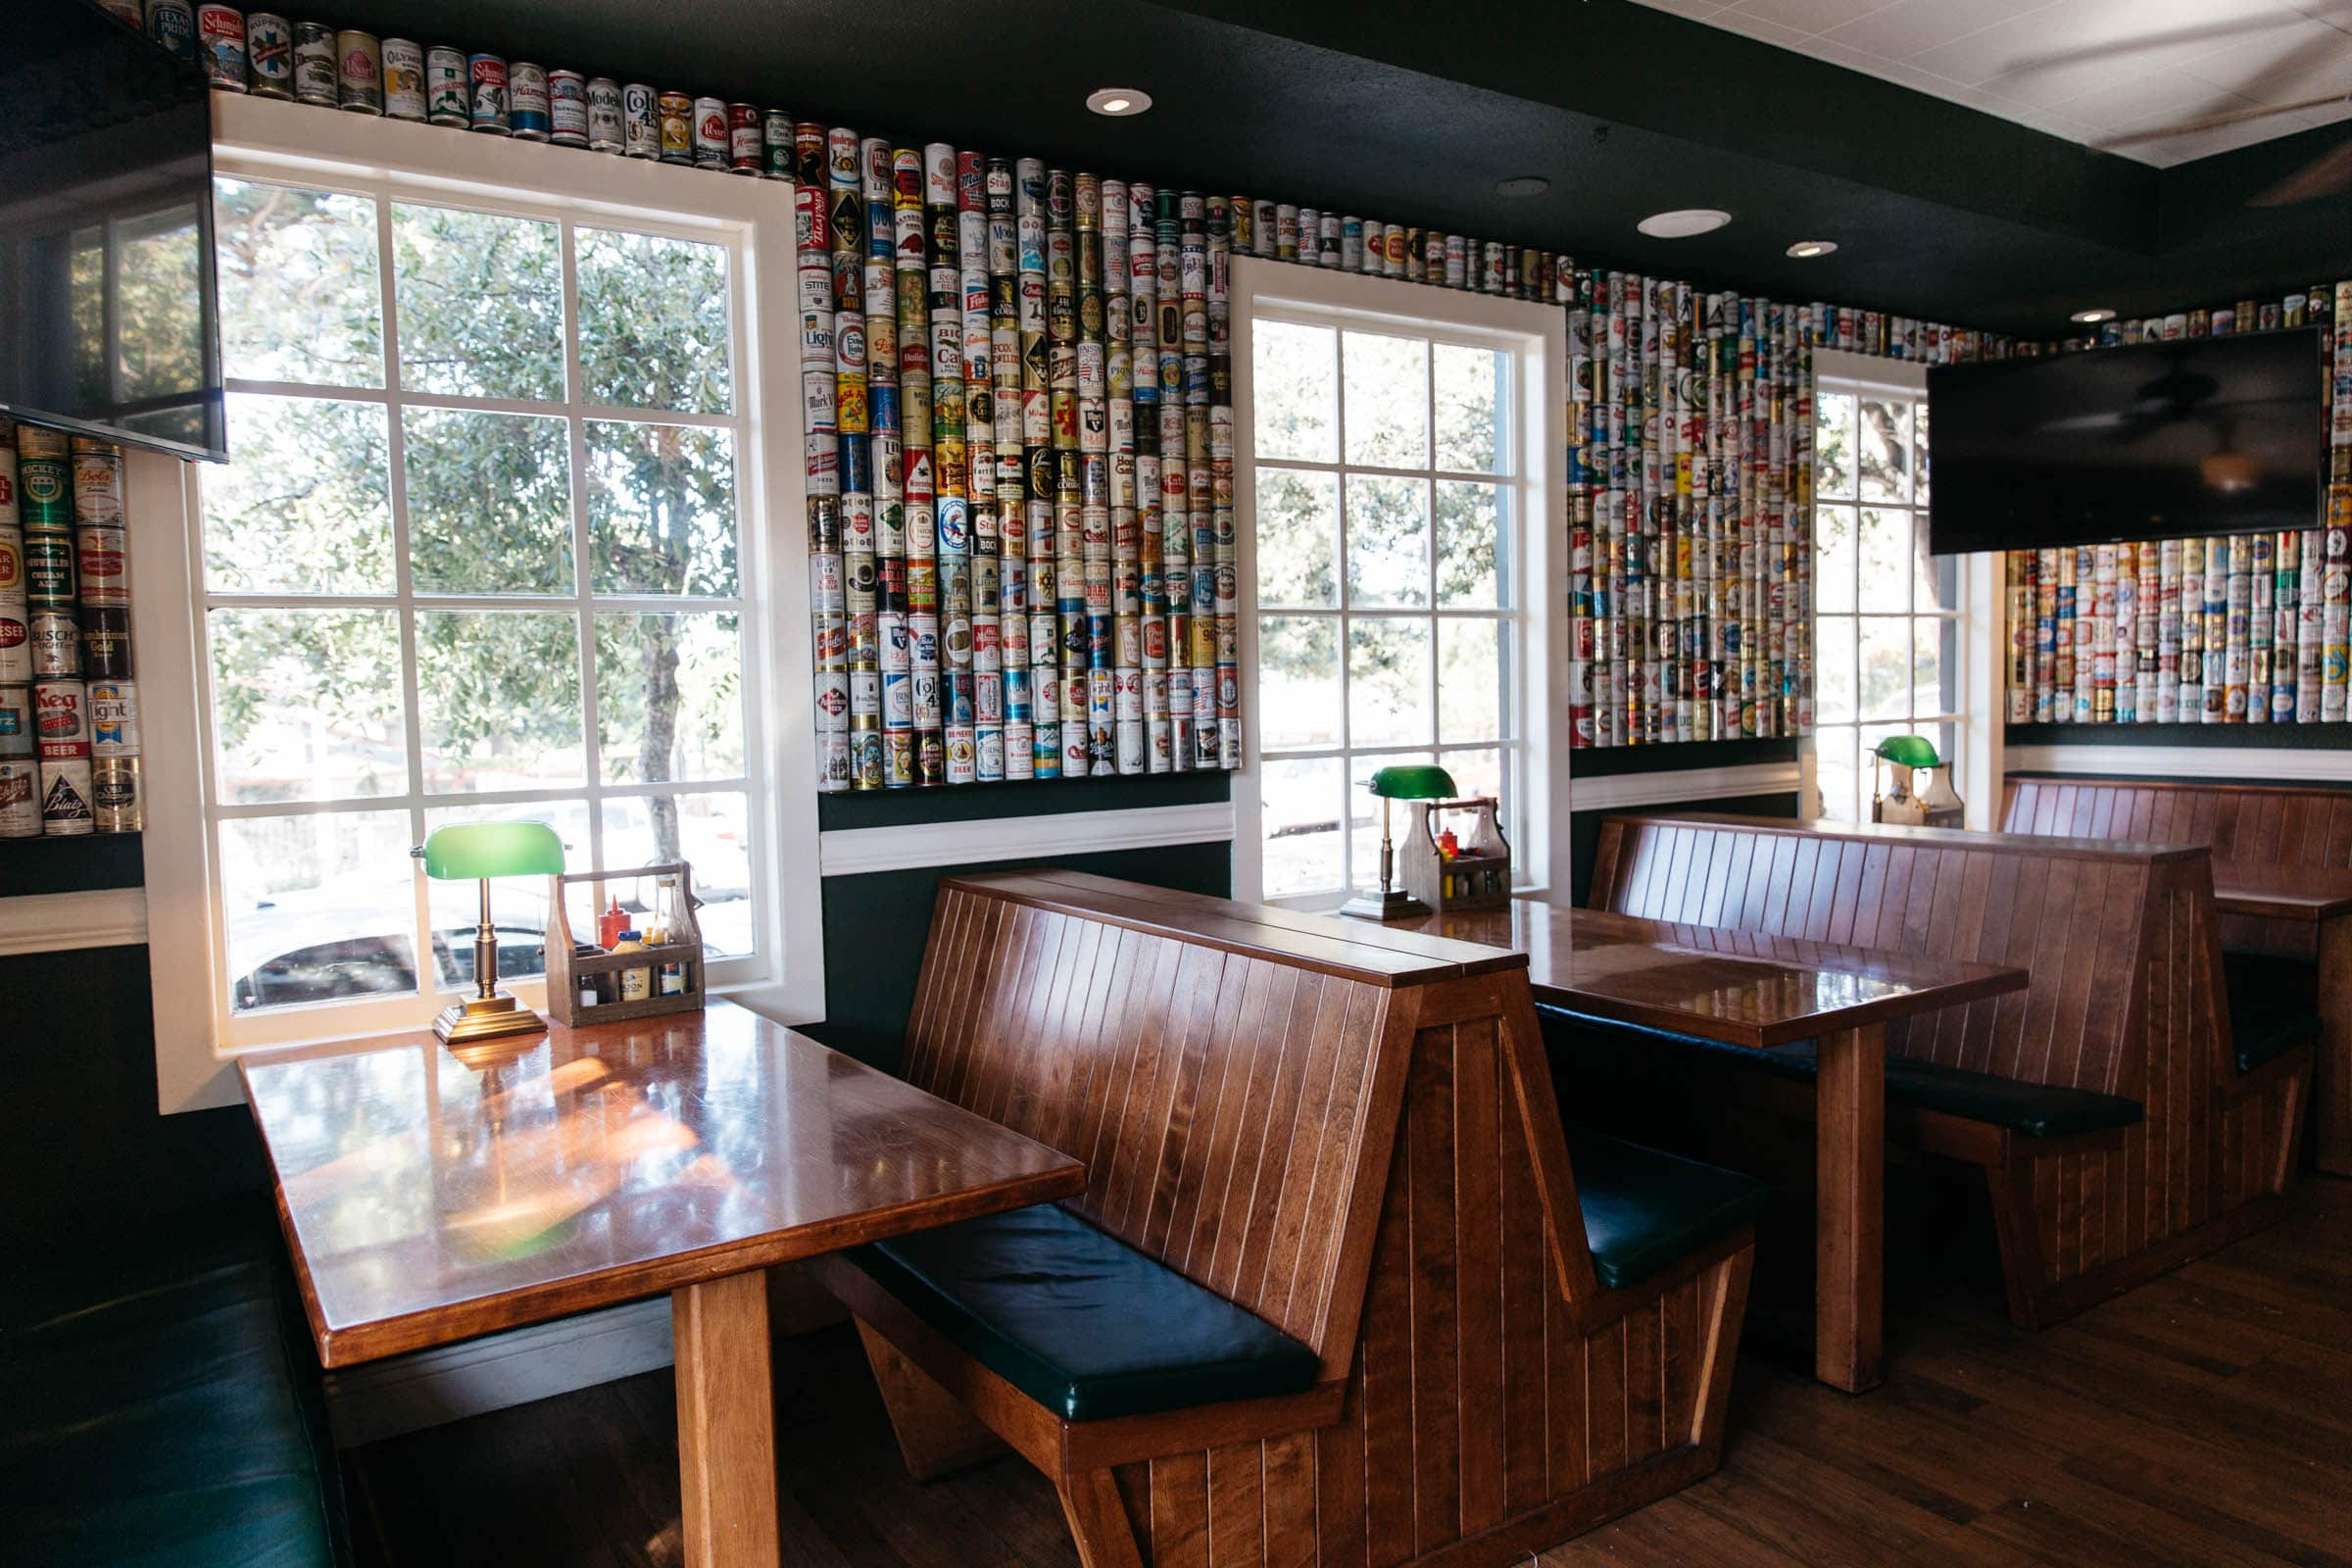 brofy's tavern